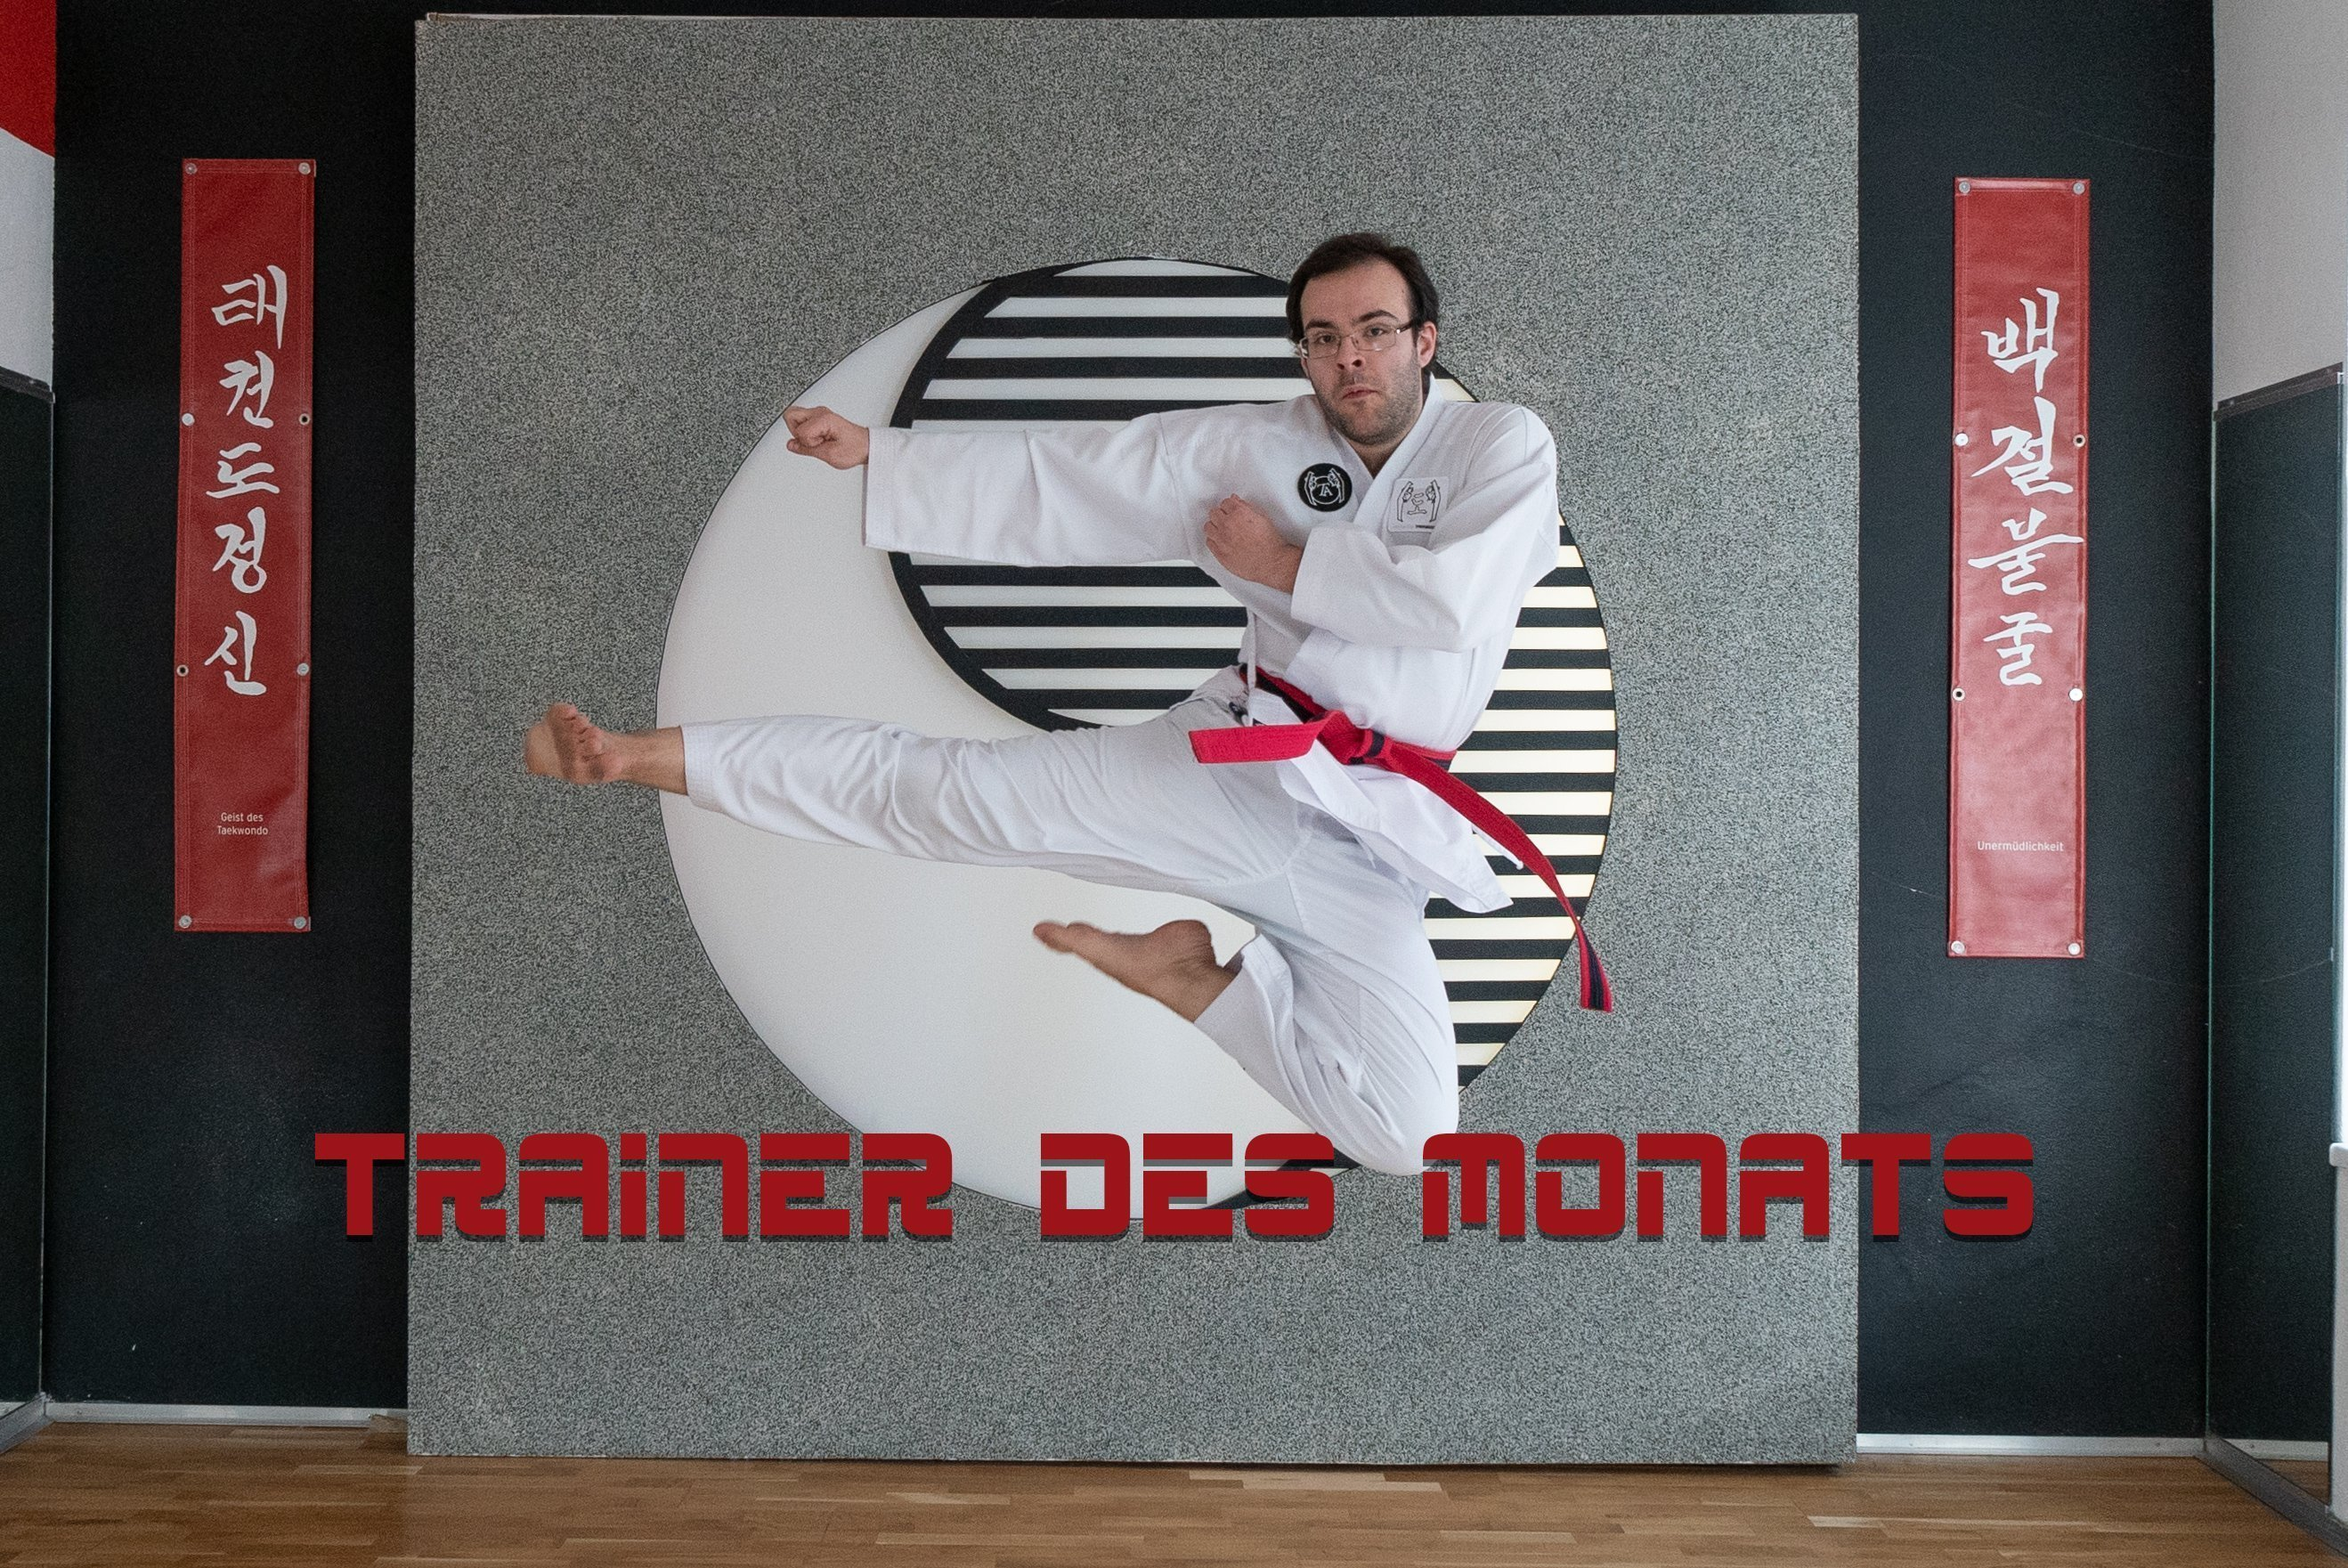 YOUNG-UNG Taekwondo Trainer des Monats Paul Radl